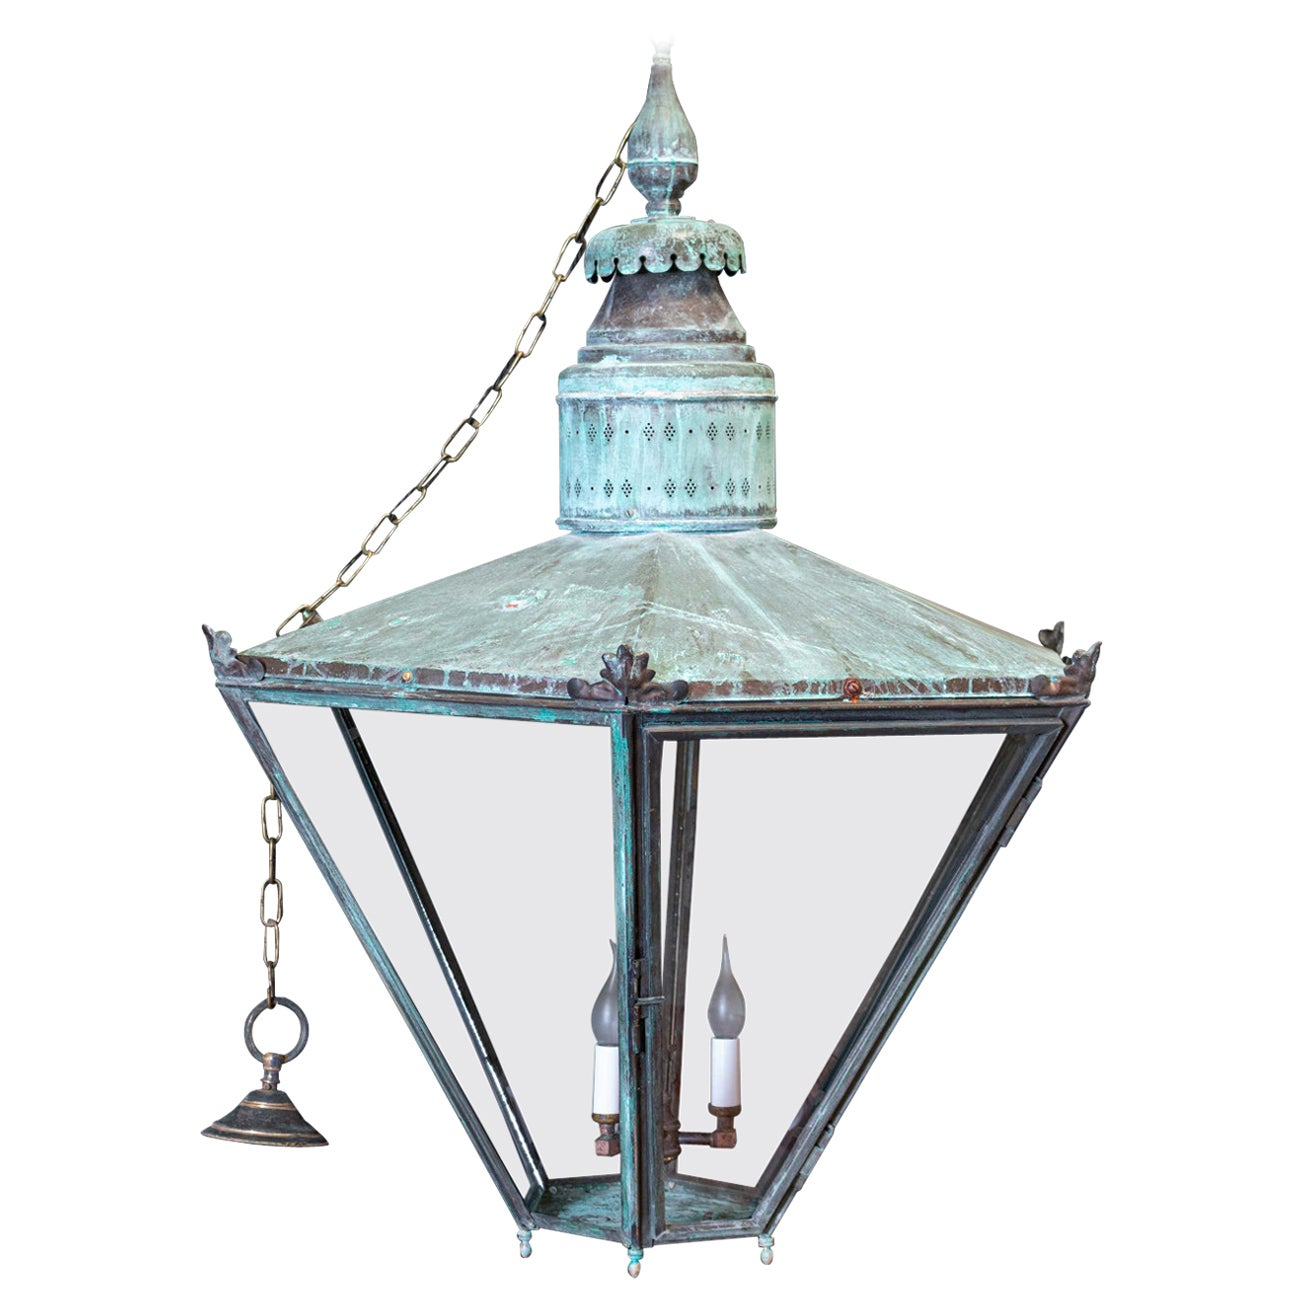 19thC English Oversized Hexagonal Verdigris Statement Lantern